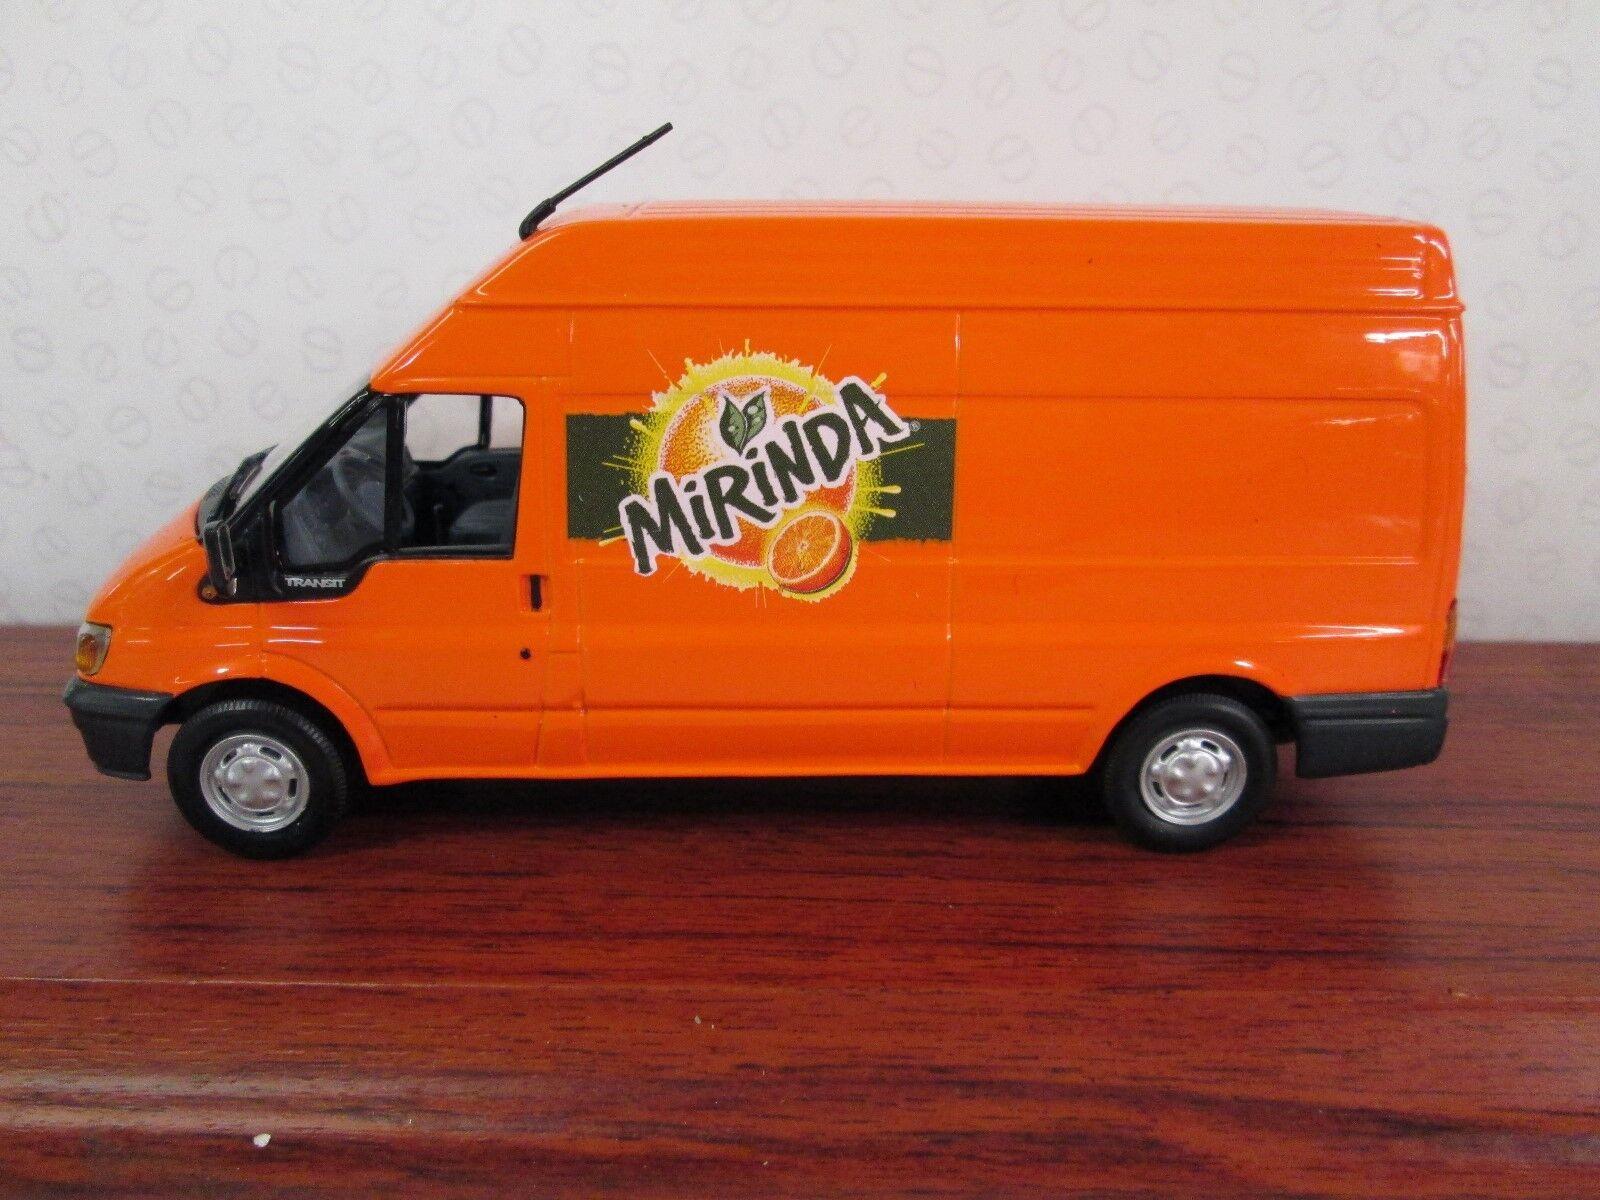 MINICHAMPS. Ford Transit Van 2000. 1 43. Miranda. Ltd Ed. orange. 430 089301.